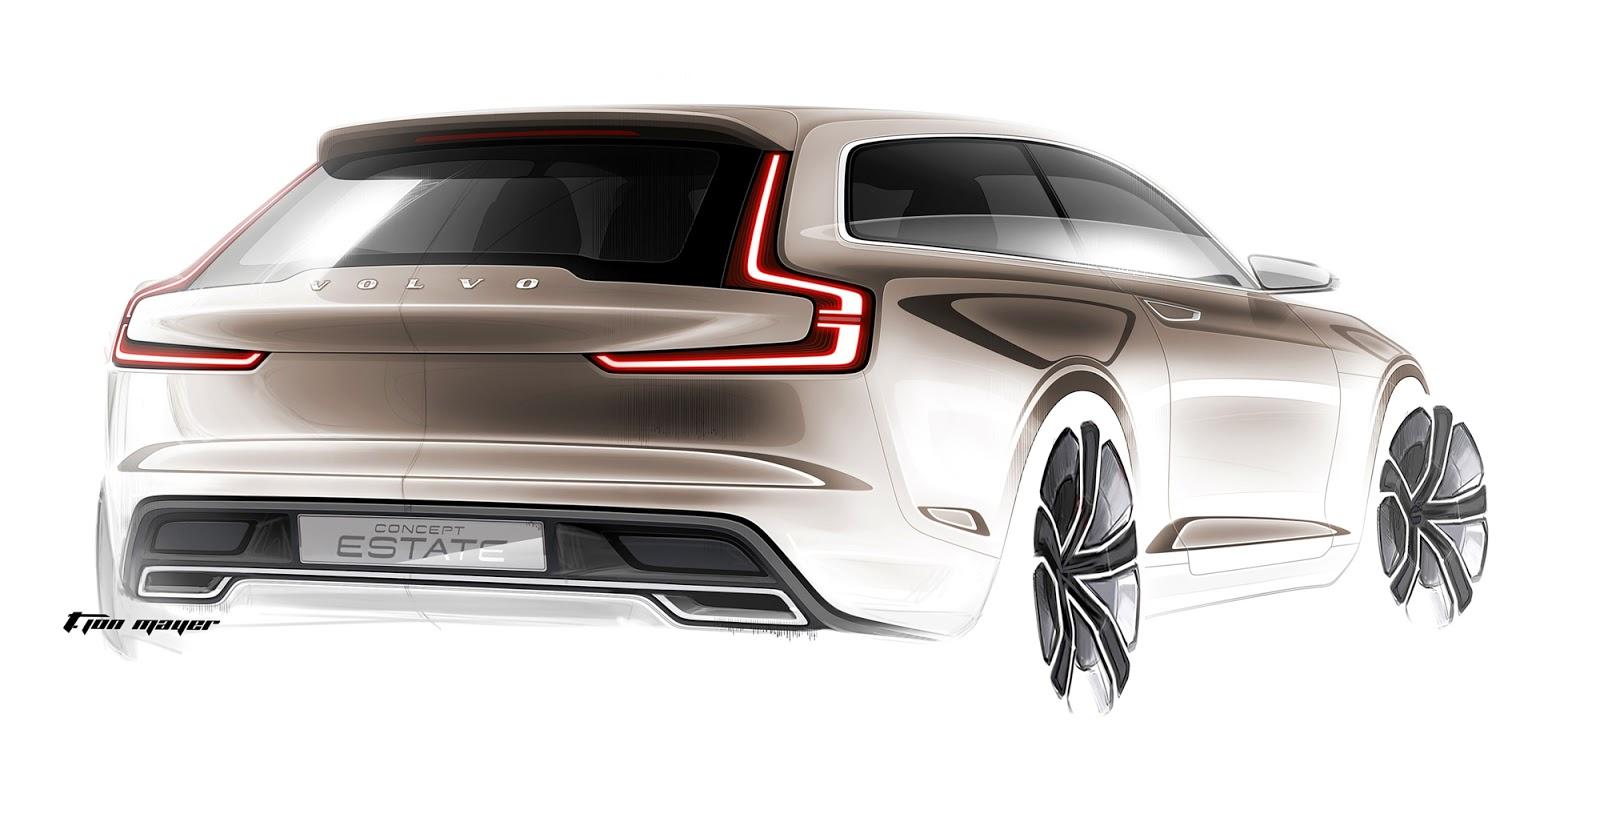 Volvo Concept Estate sketch rear quarter view by T. Jon Mayer